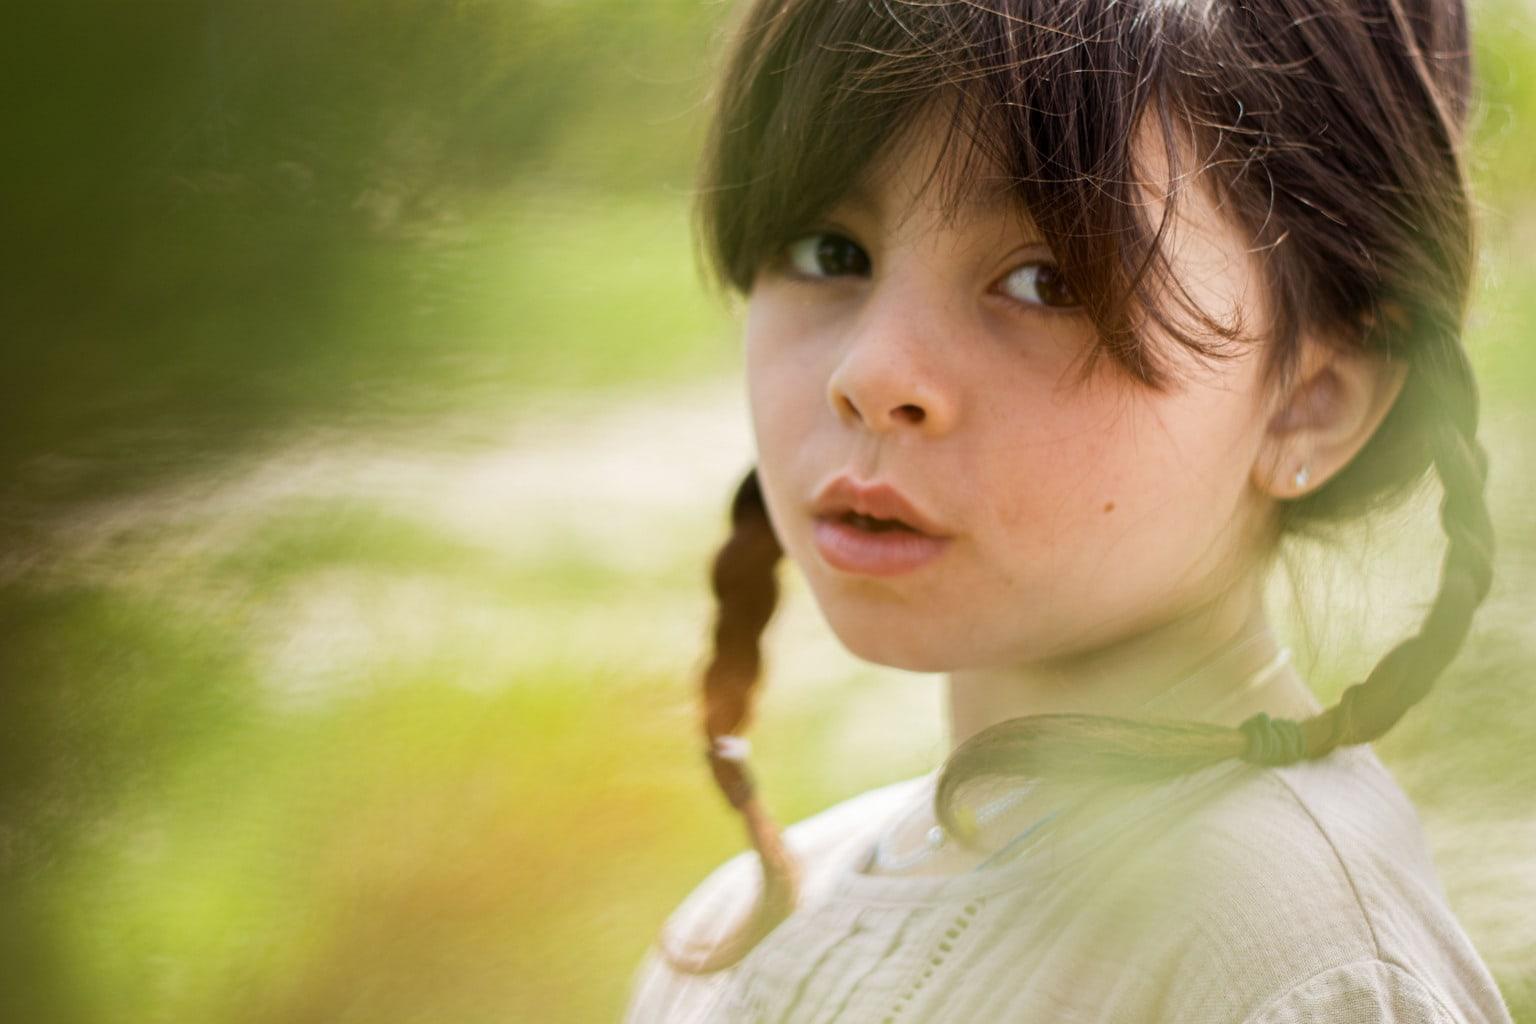 Retrato de niña fotografiado con un objetivo 50mm